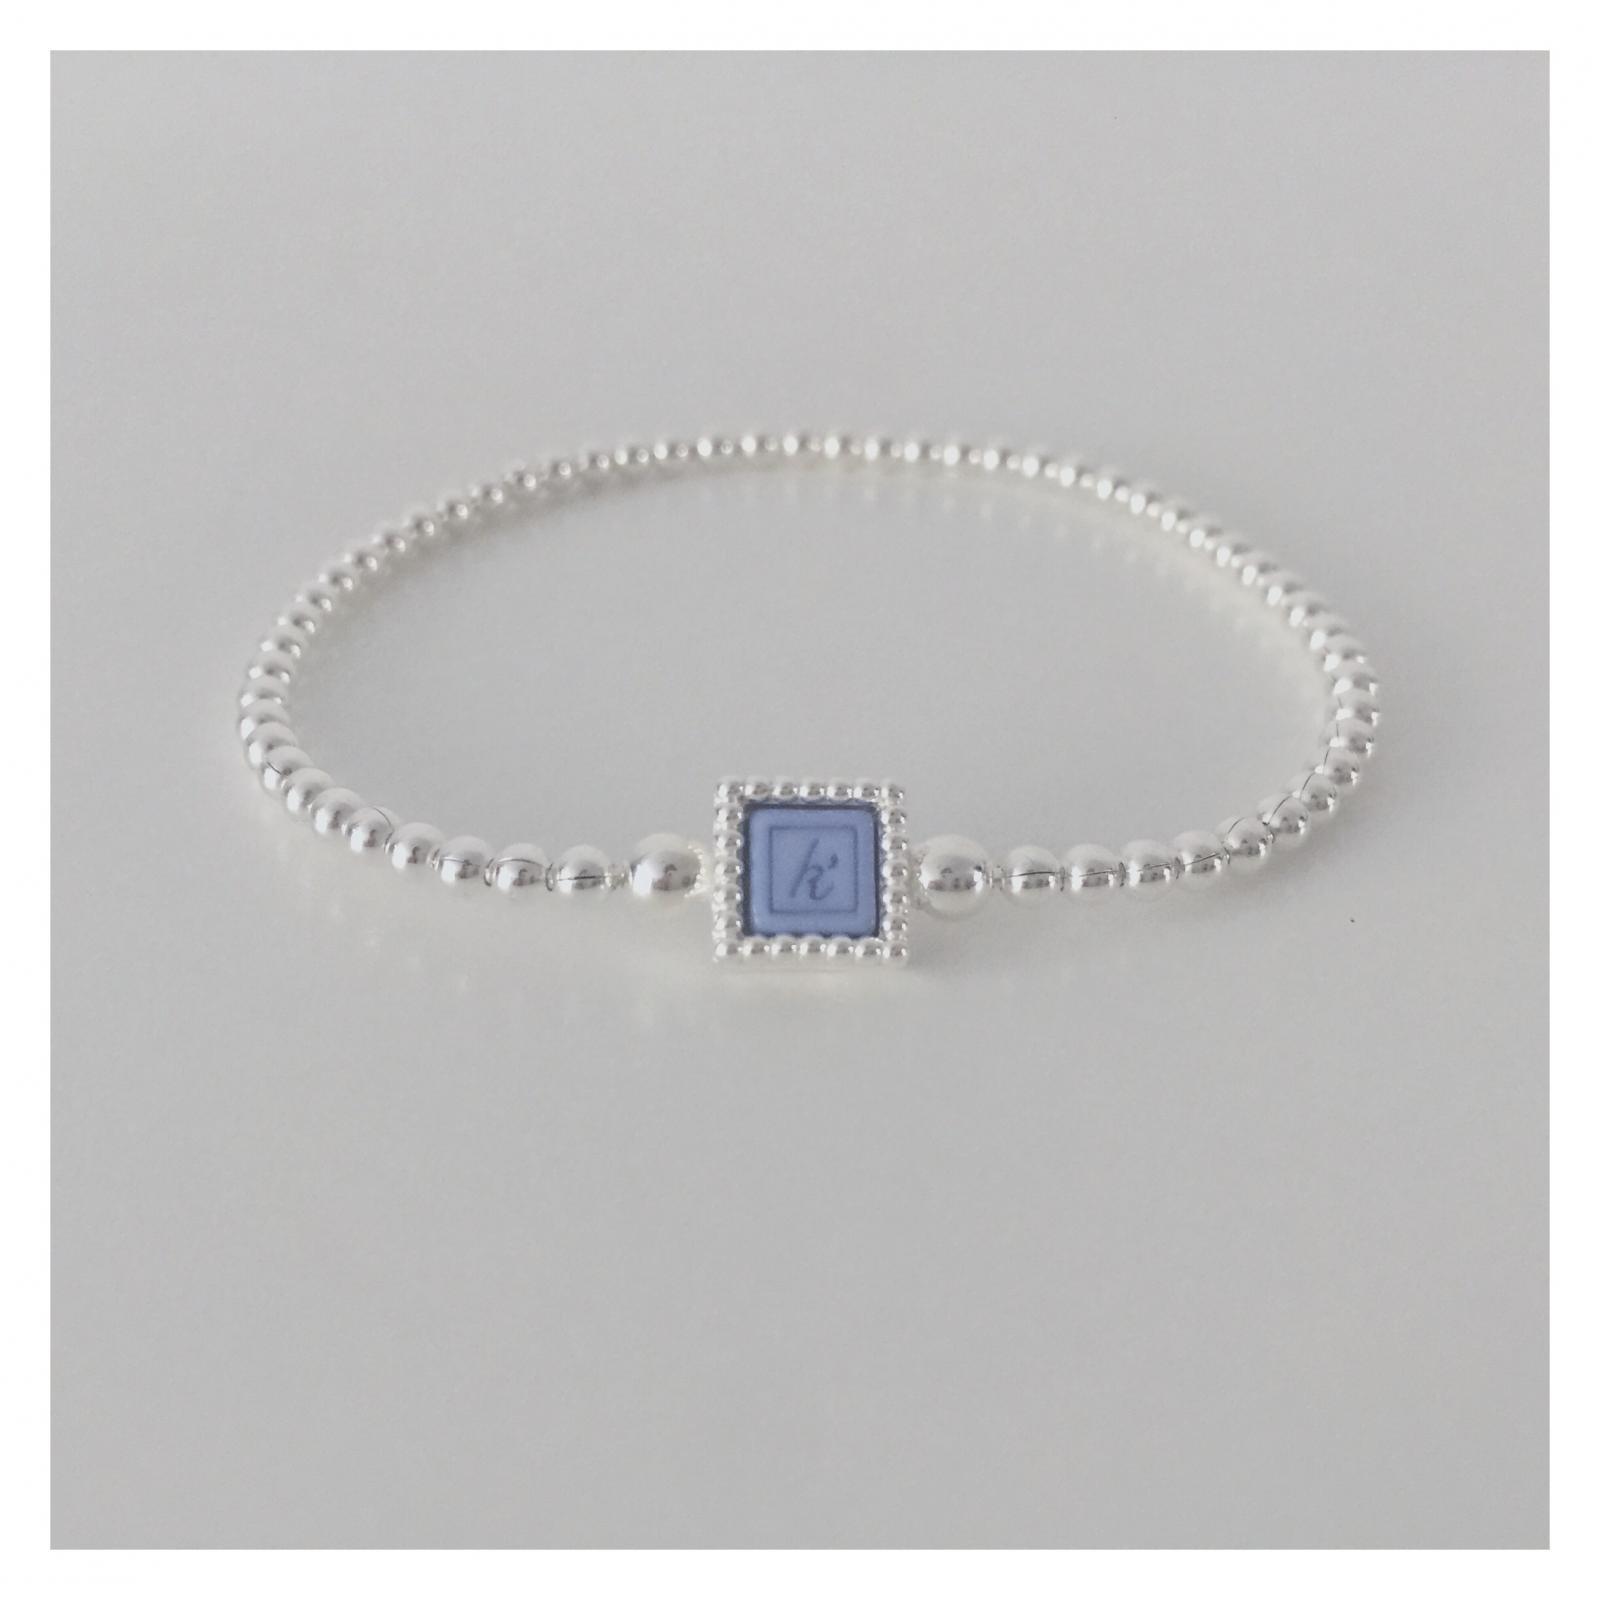 Flexibele 925 sterling zilveren armband met vierkante kasminis